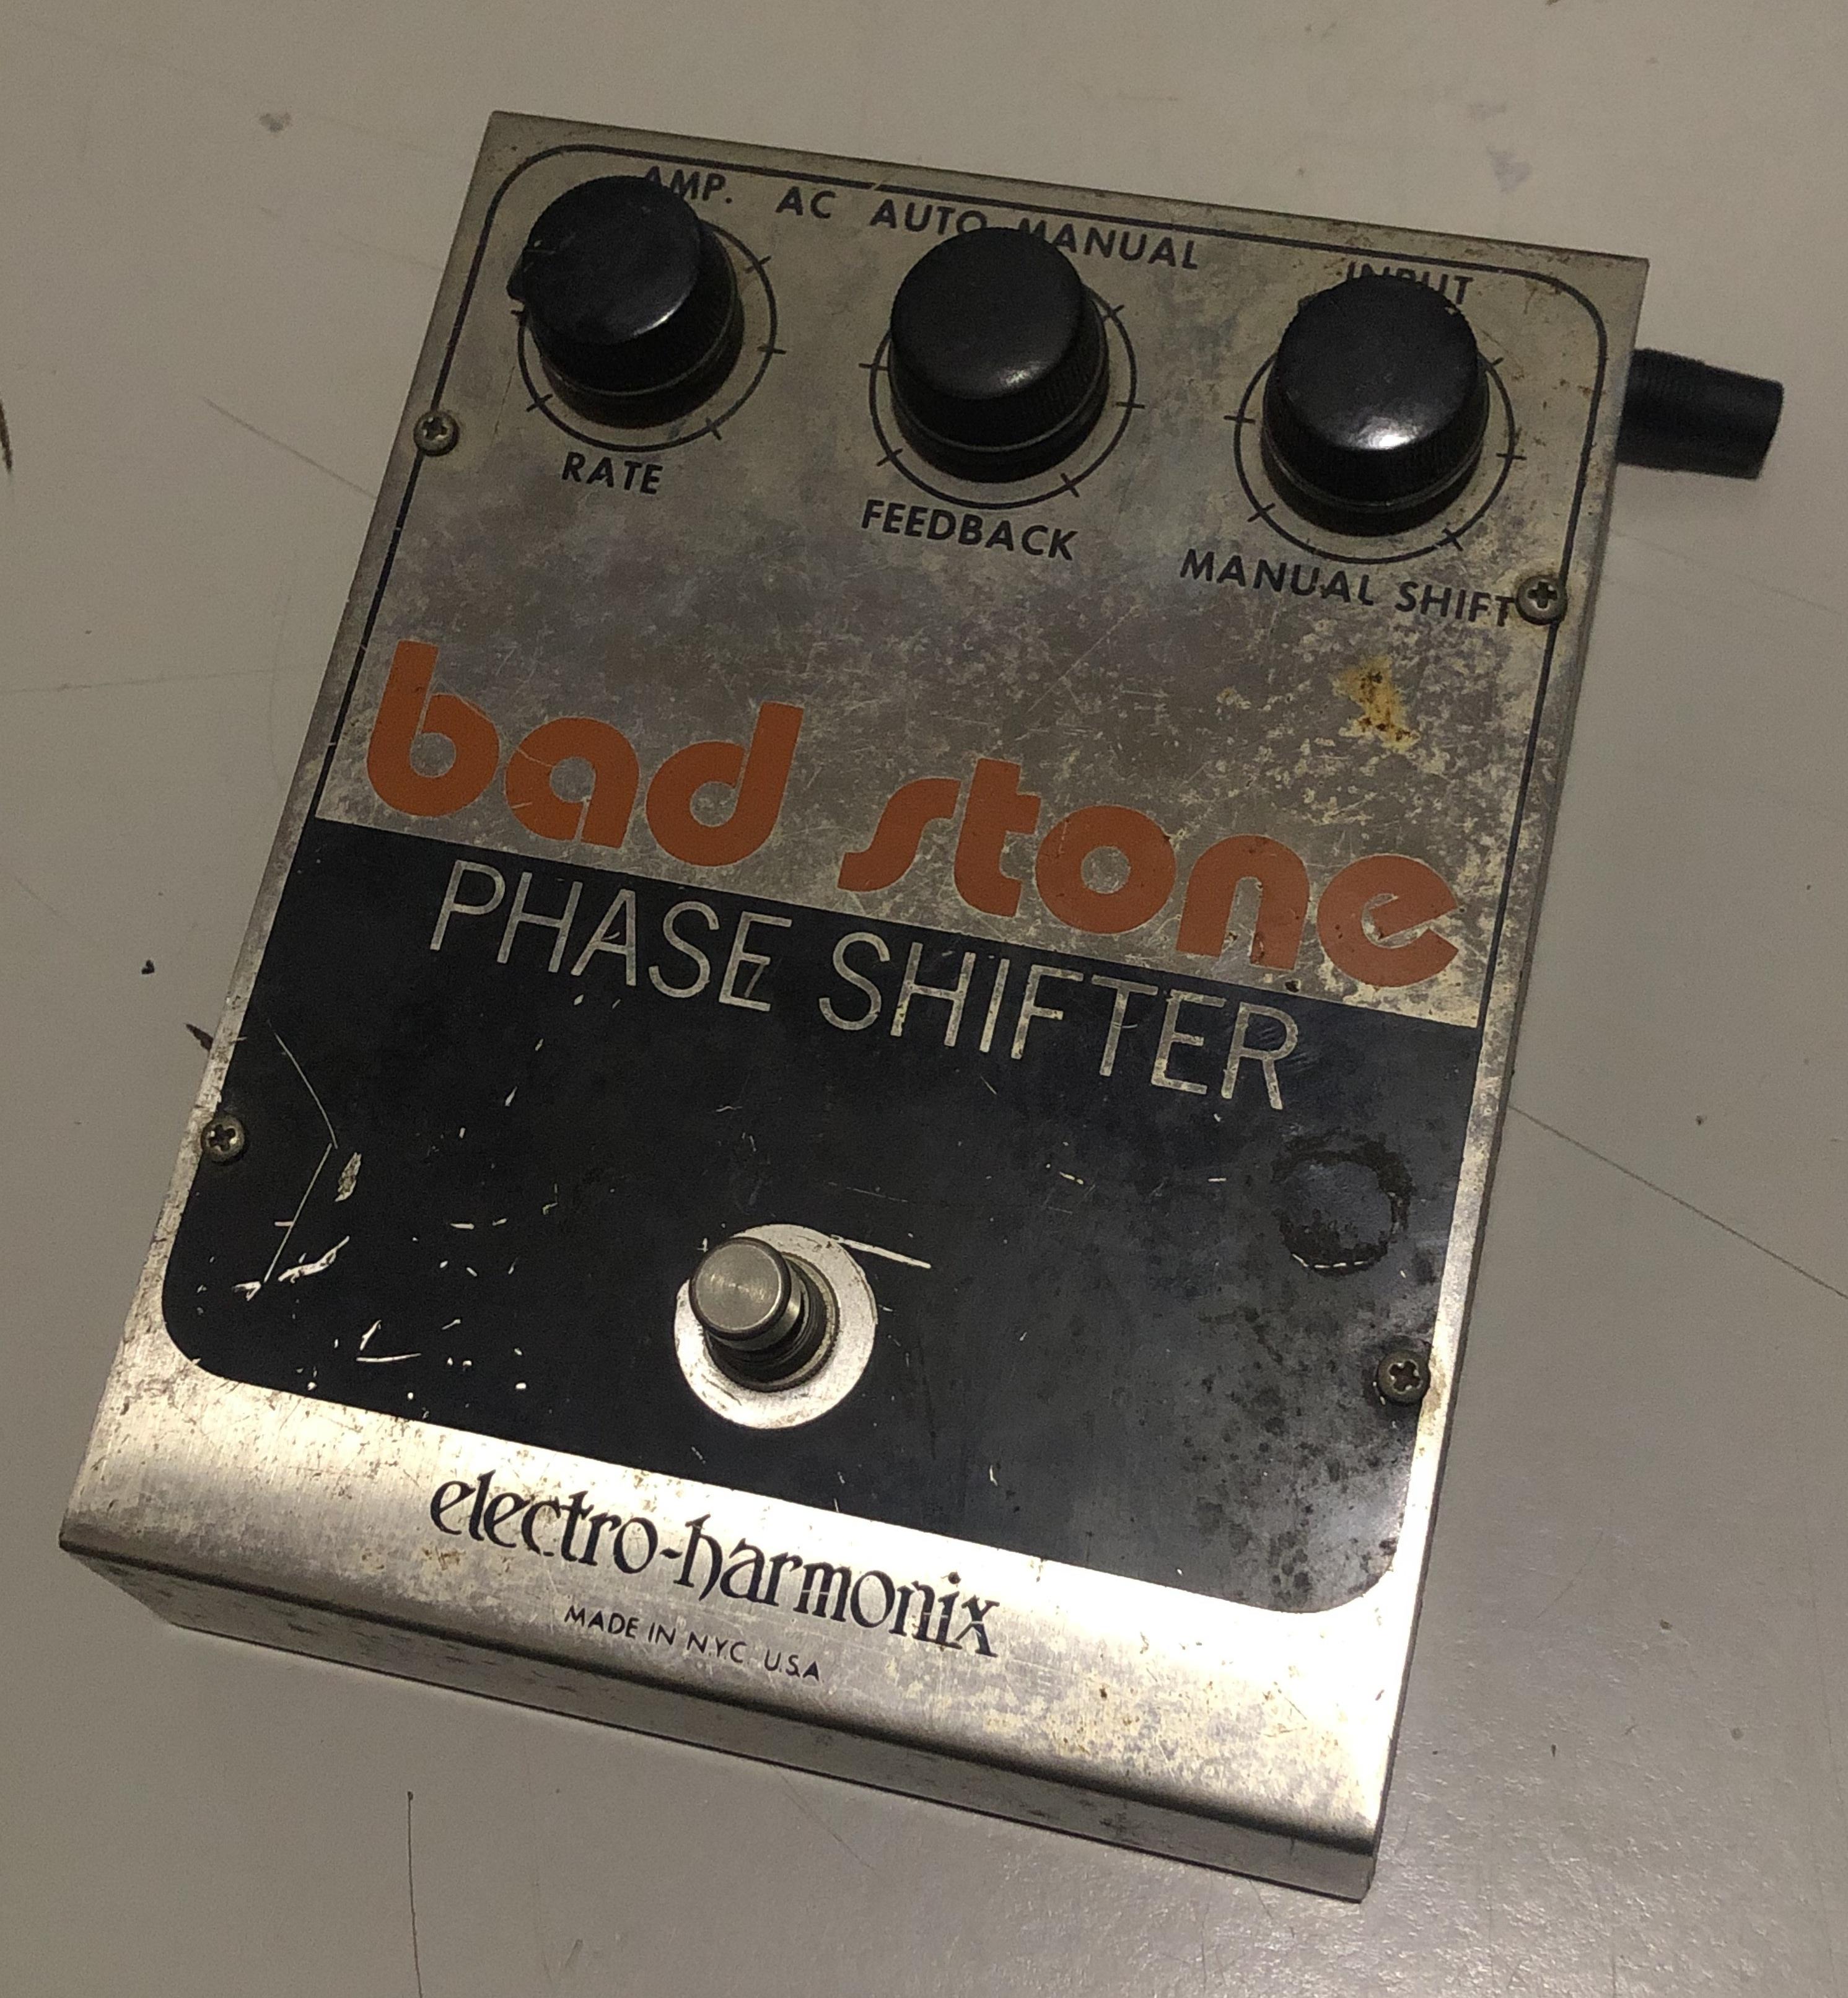 ELECTRO-HARMONIX - Bad Stone Phase Shifter Pedal *70's Vintage*